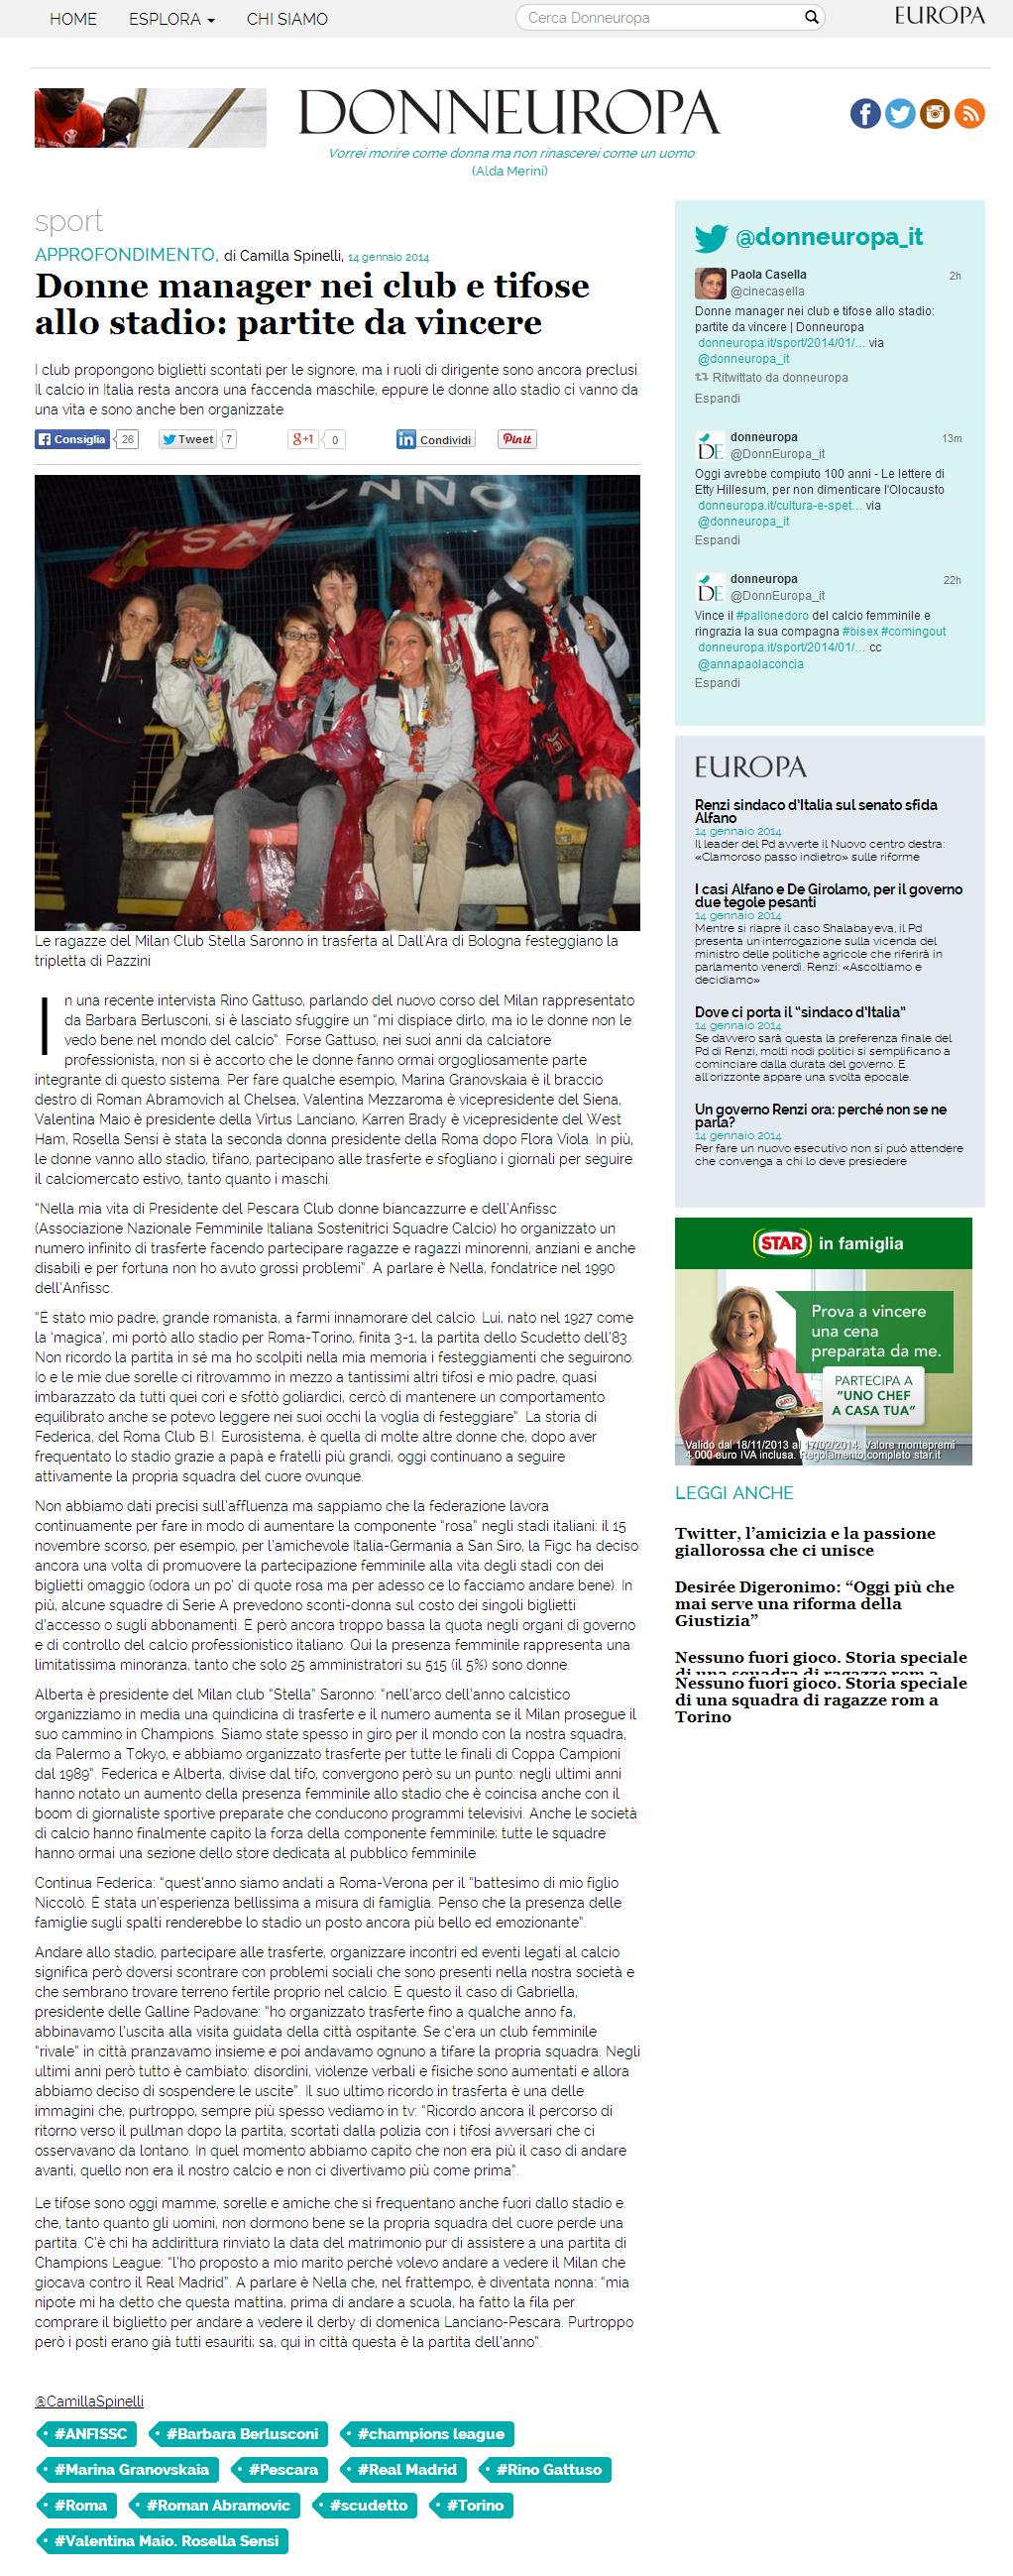 2014-01-14 donneuropa